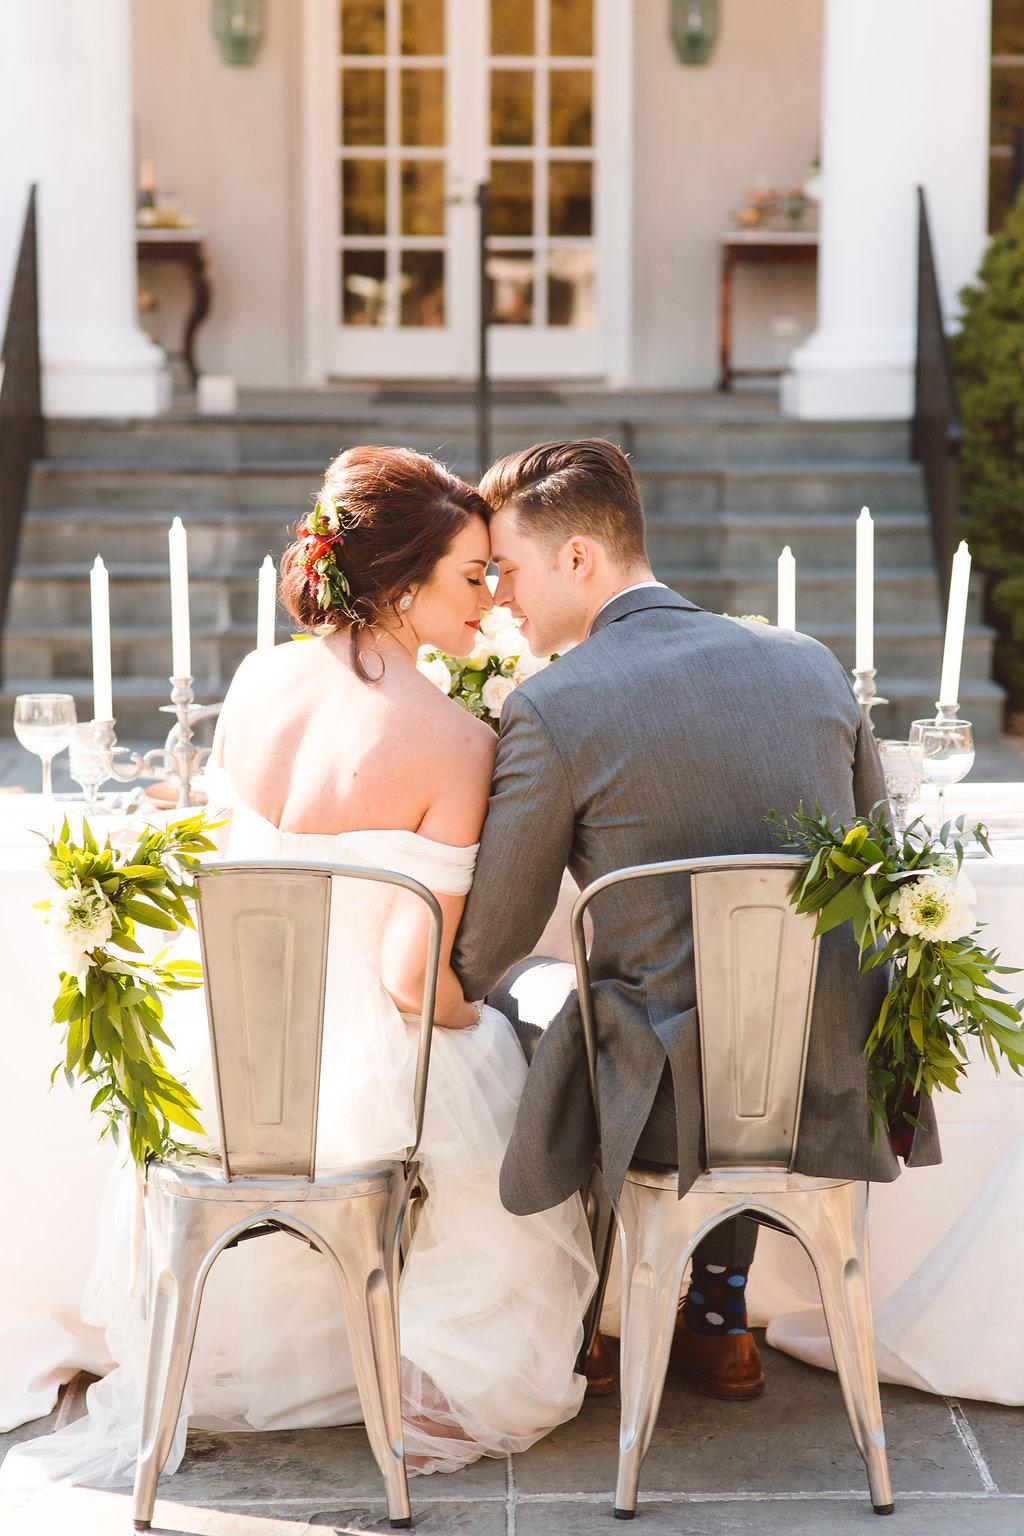 french-wedding-inspiration-137.jpg